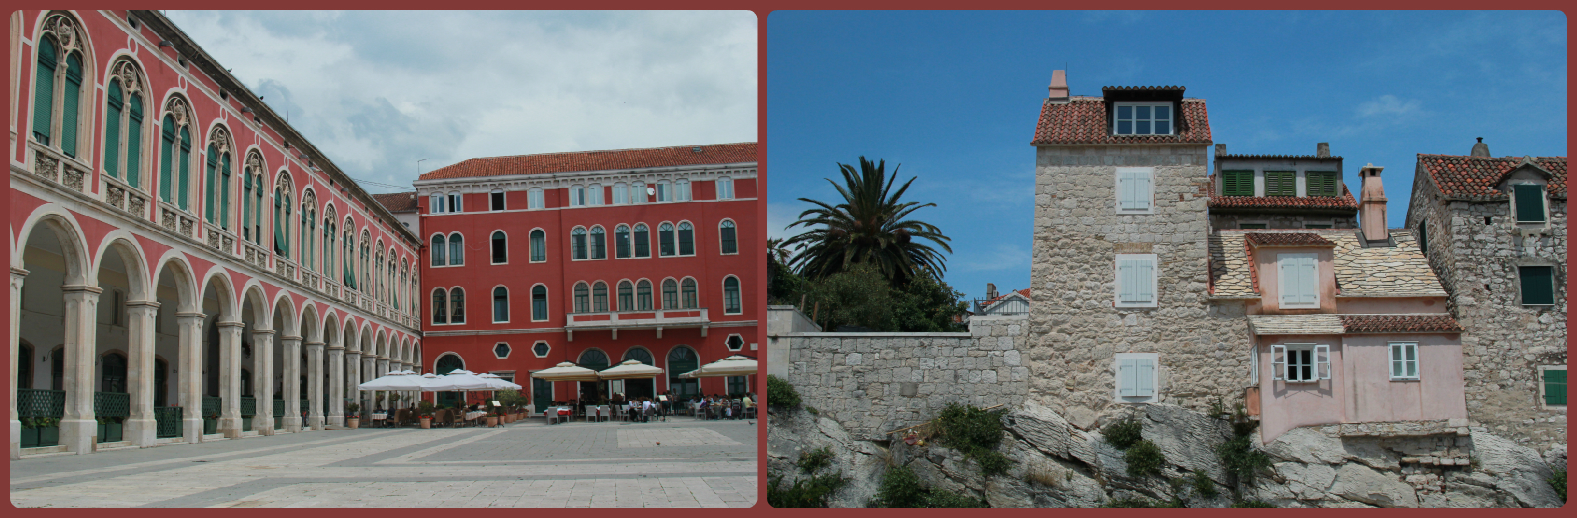 Split's architecture